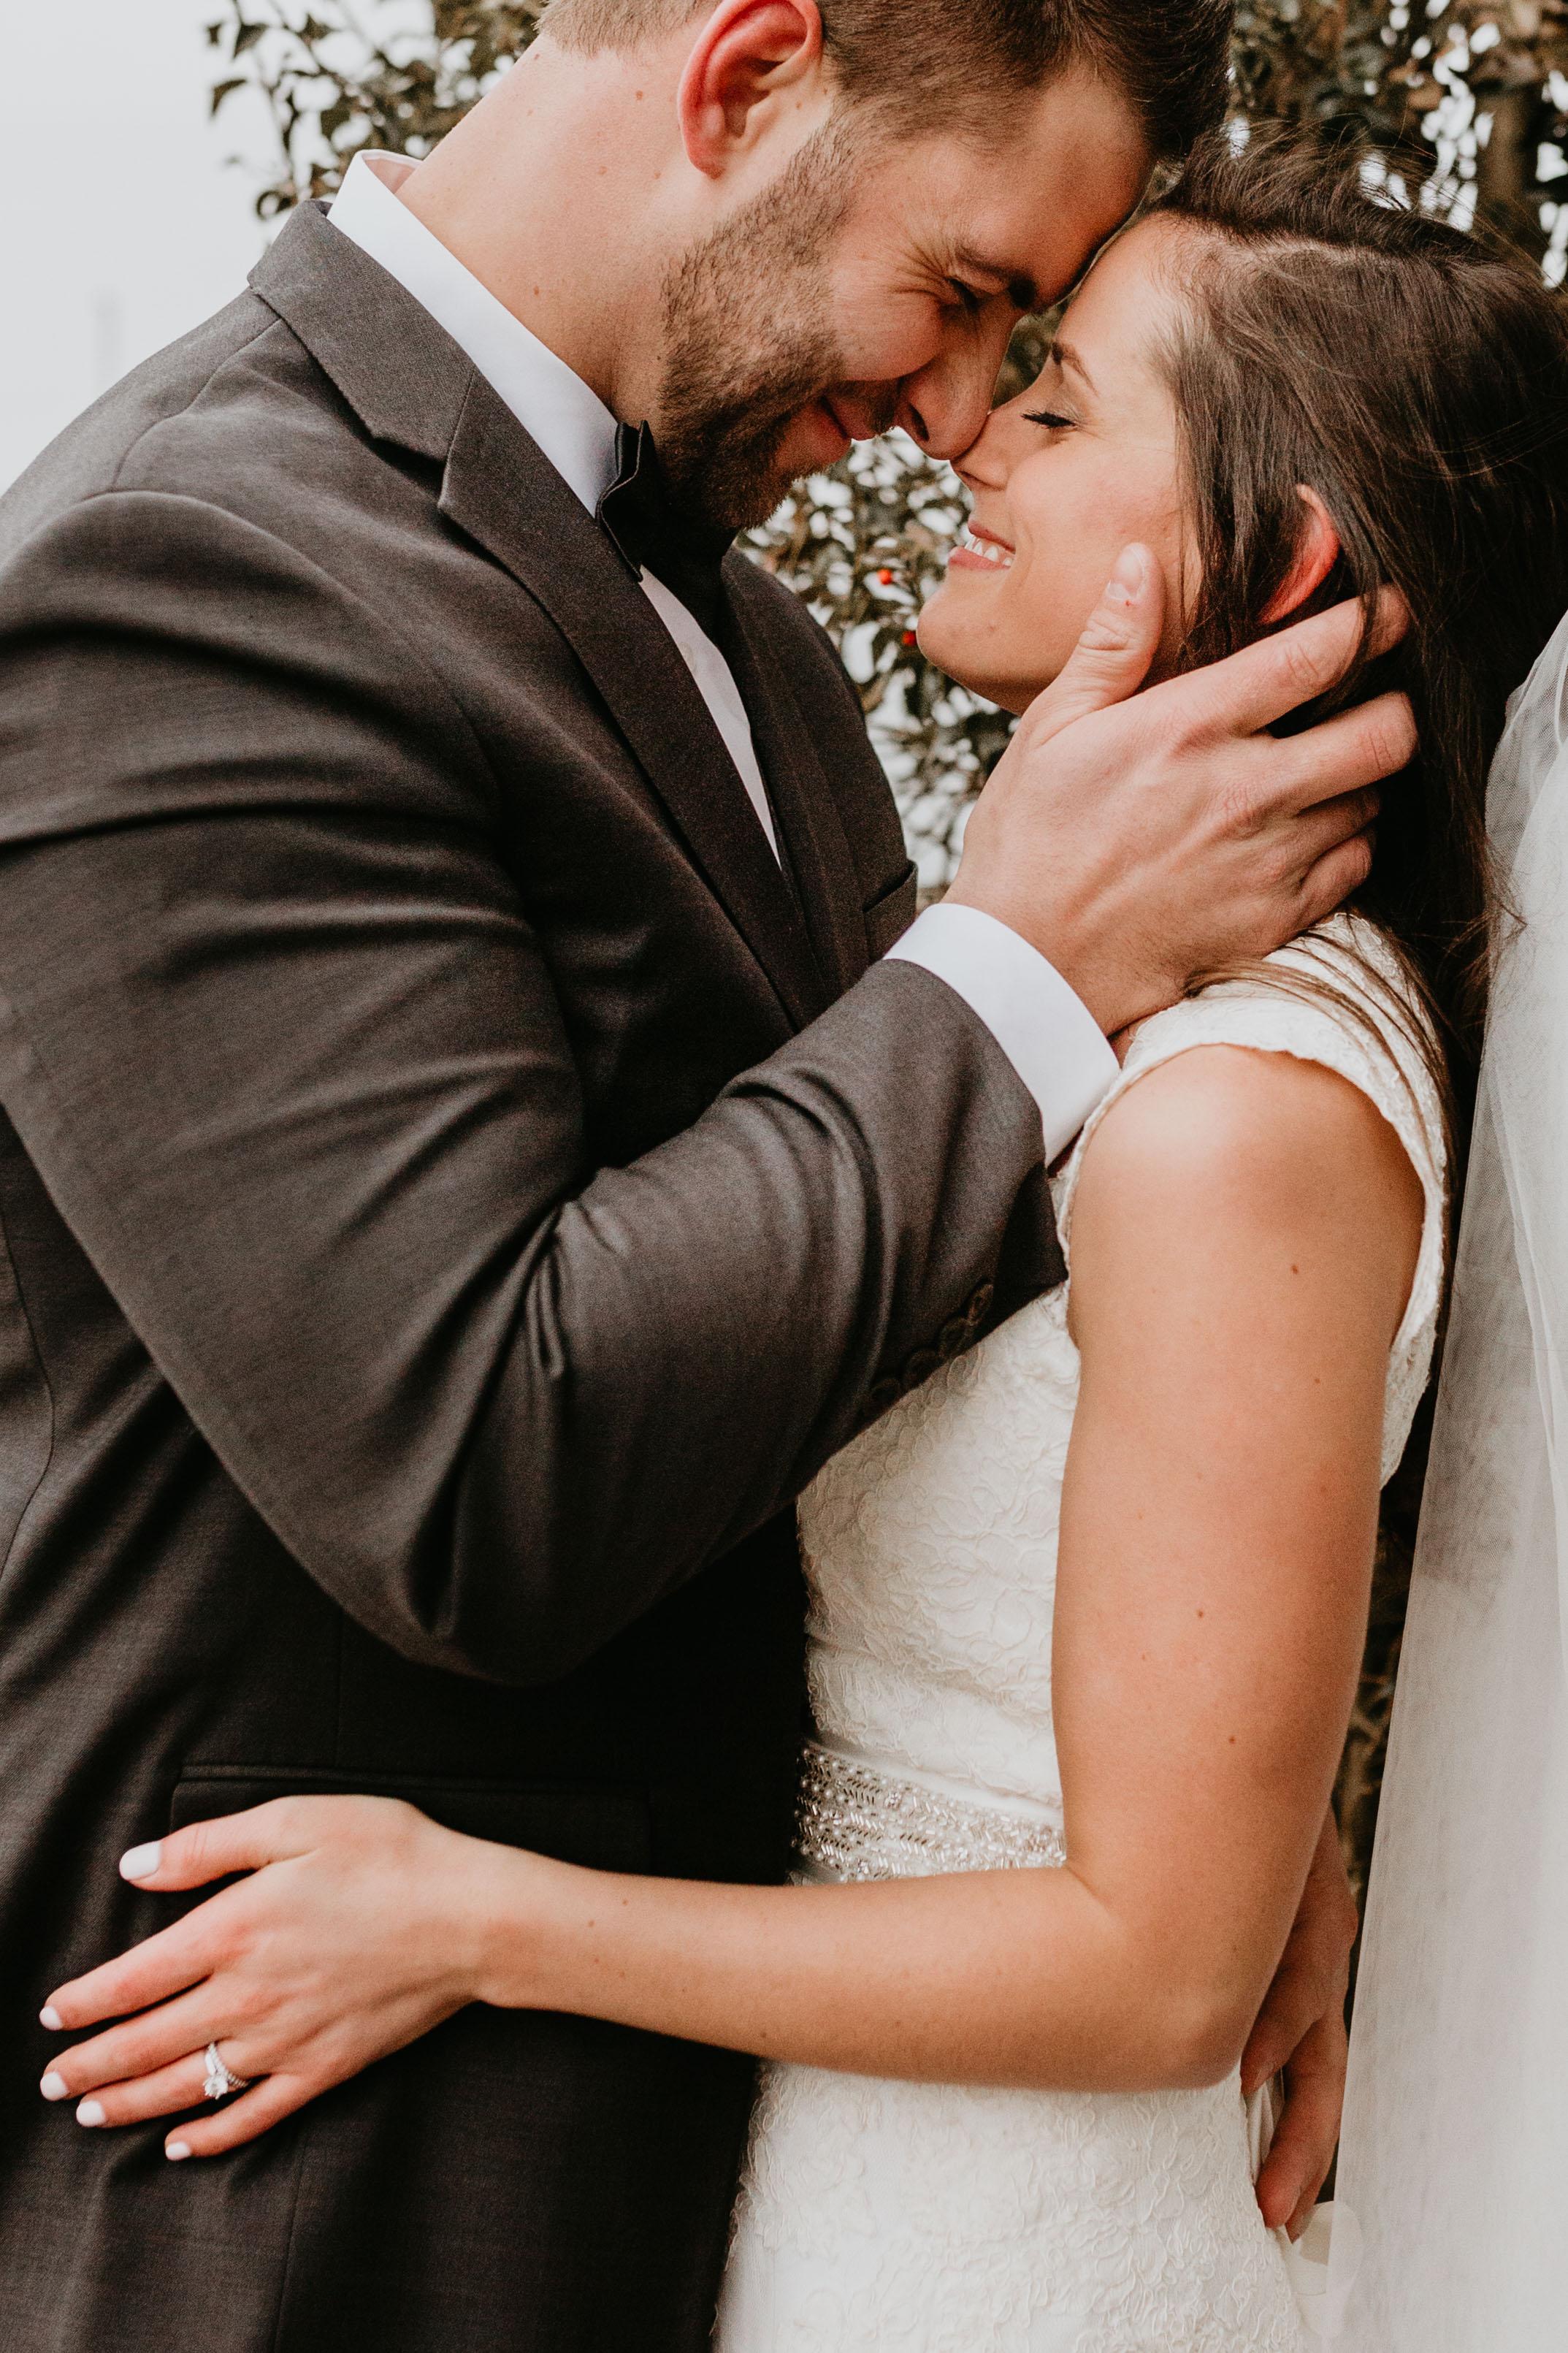 nicole-daacke-photography-boston-massachusetts-seaside-intimate-winter-wedding-photographer-38.jpg